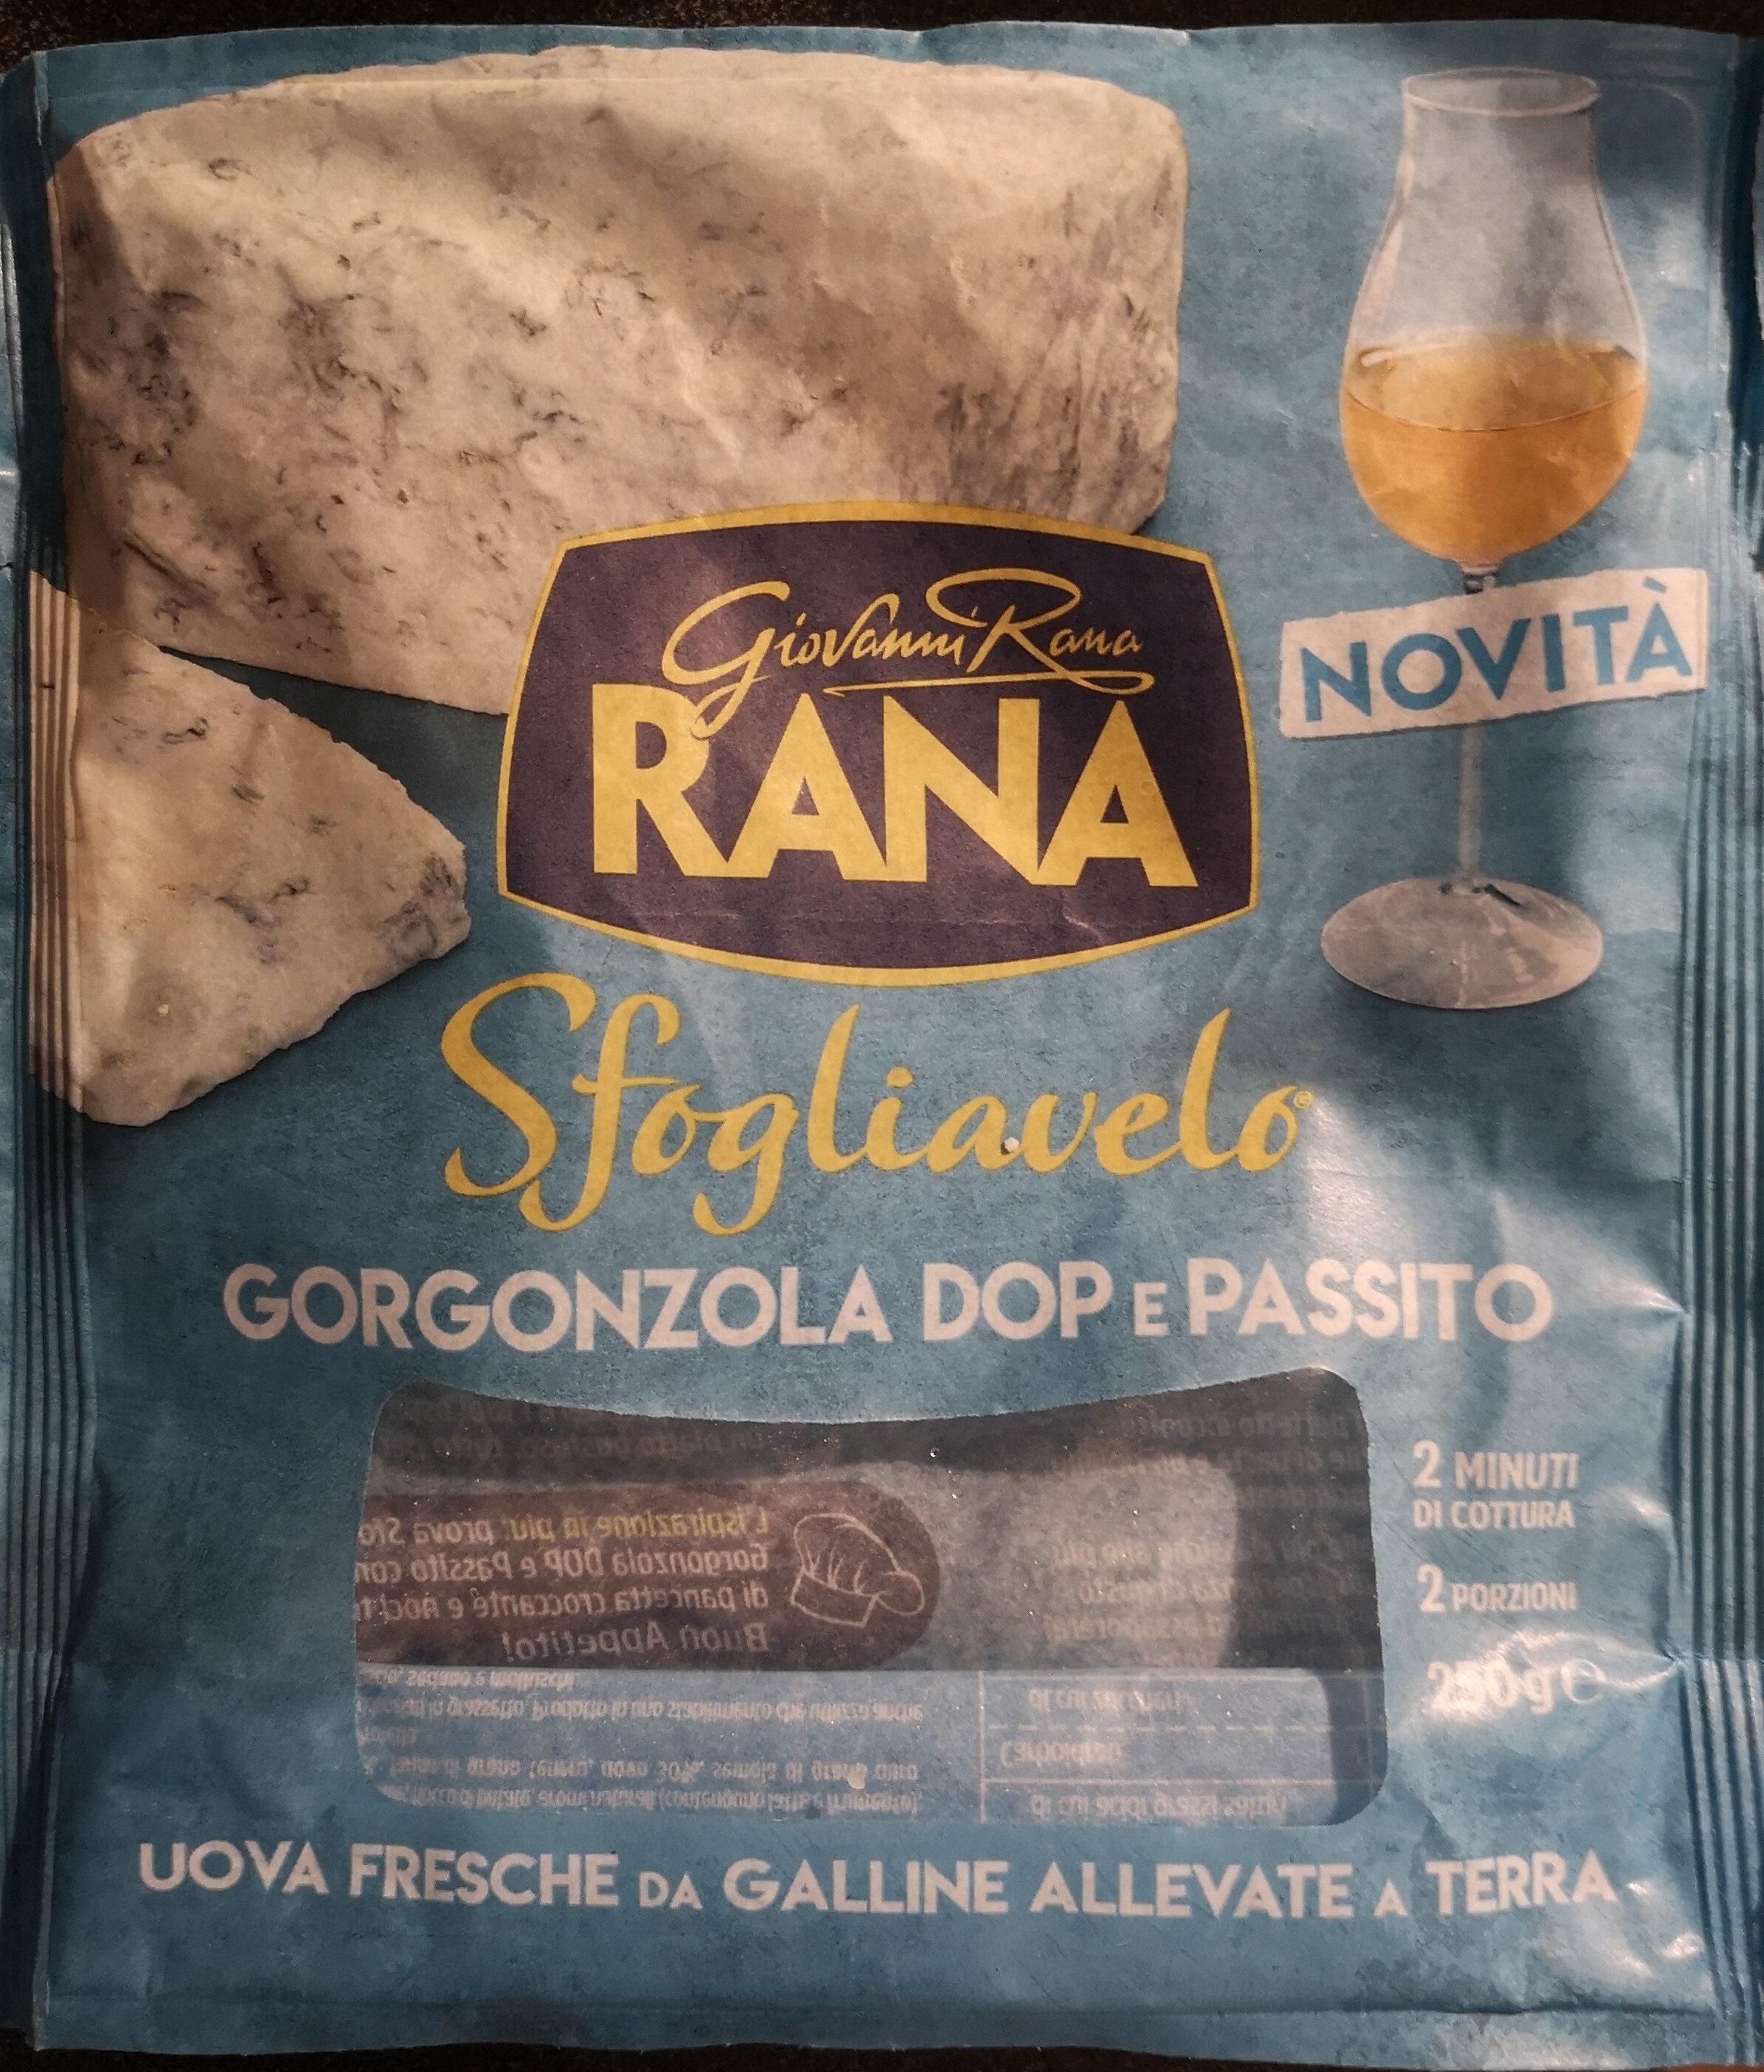 Sfogliavelo Gorgonzola DOP e passito - Product - it